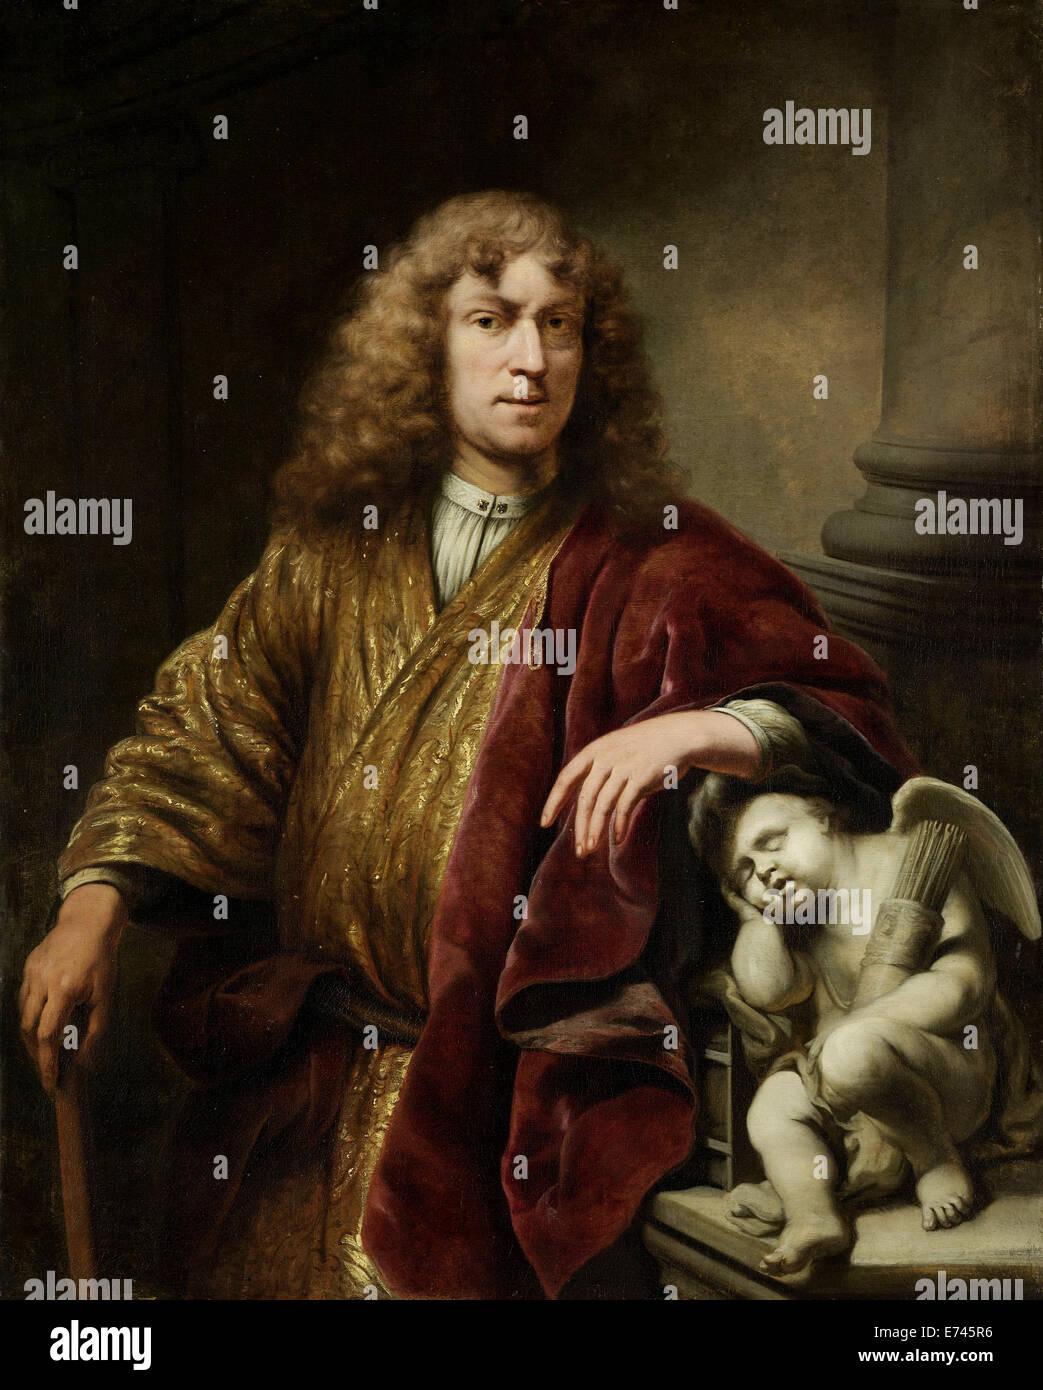 Self-portrait - by Ferdinand Bol, 1669 - Stock Image